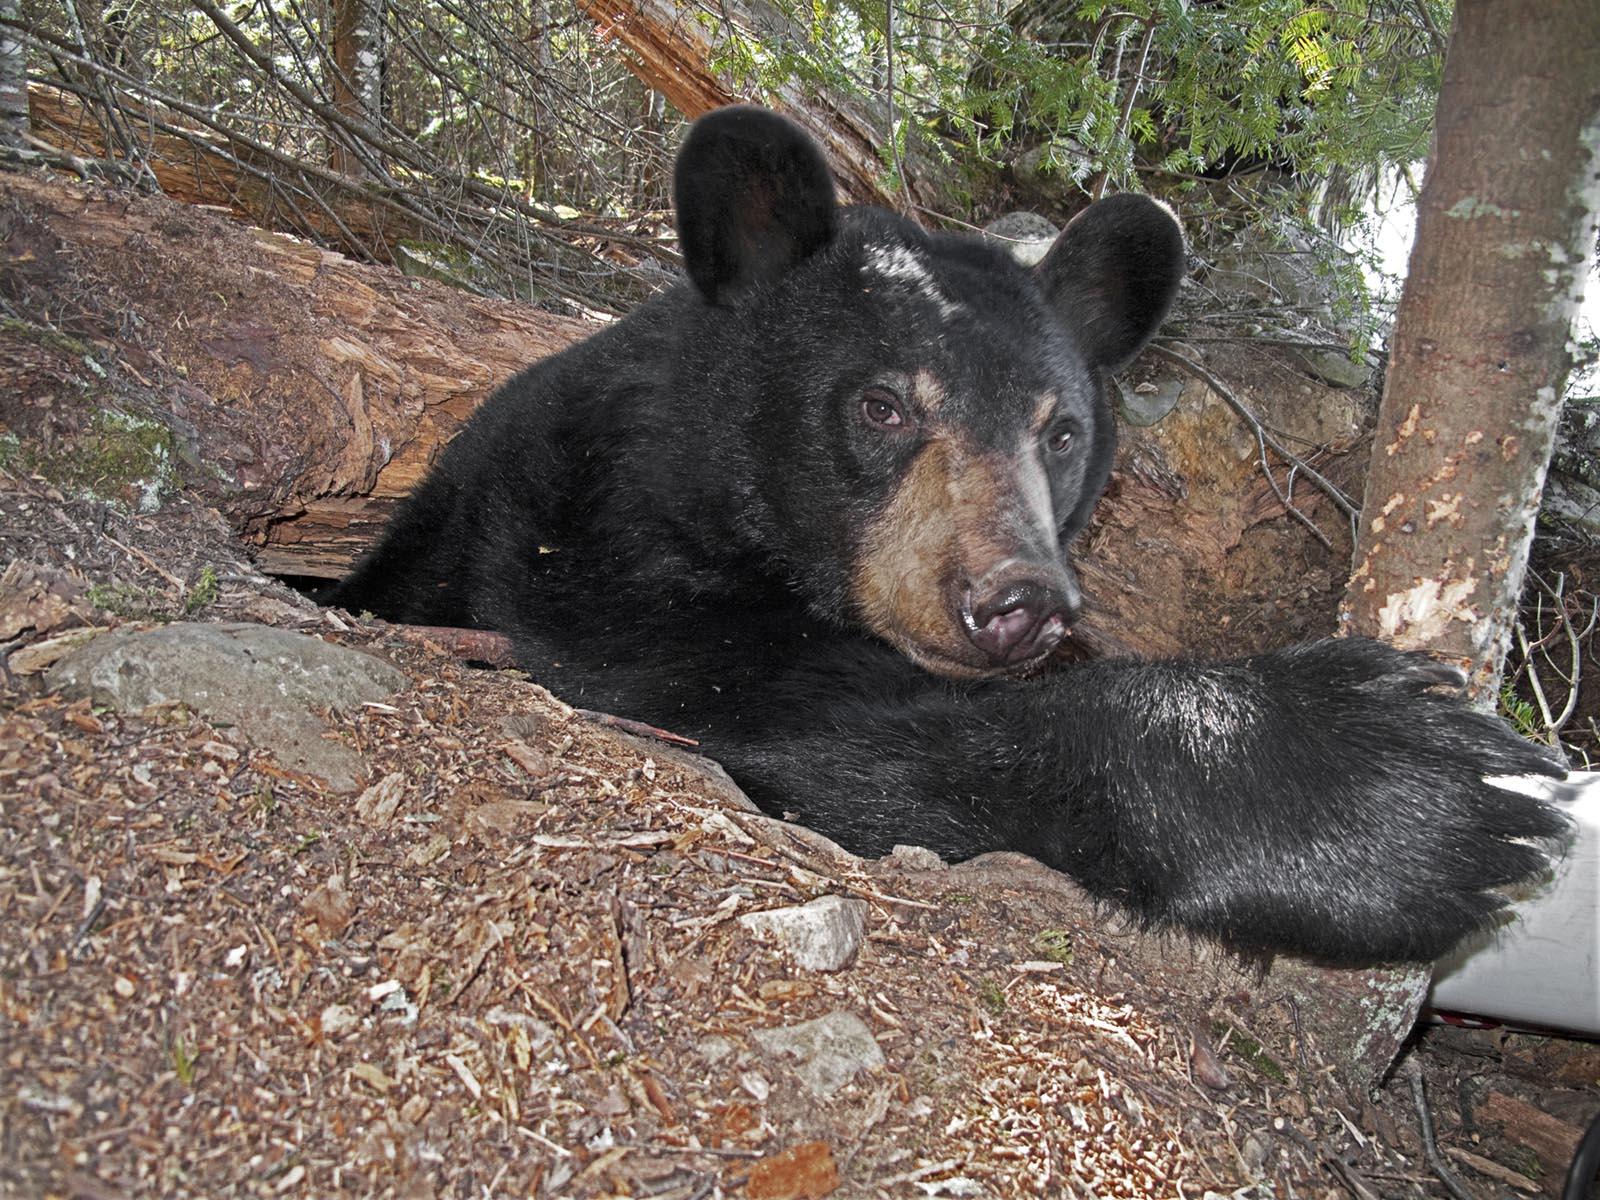 Winter Dens - North American Bear CenterNorth American Bear Center